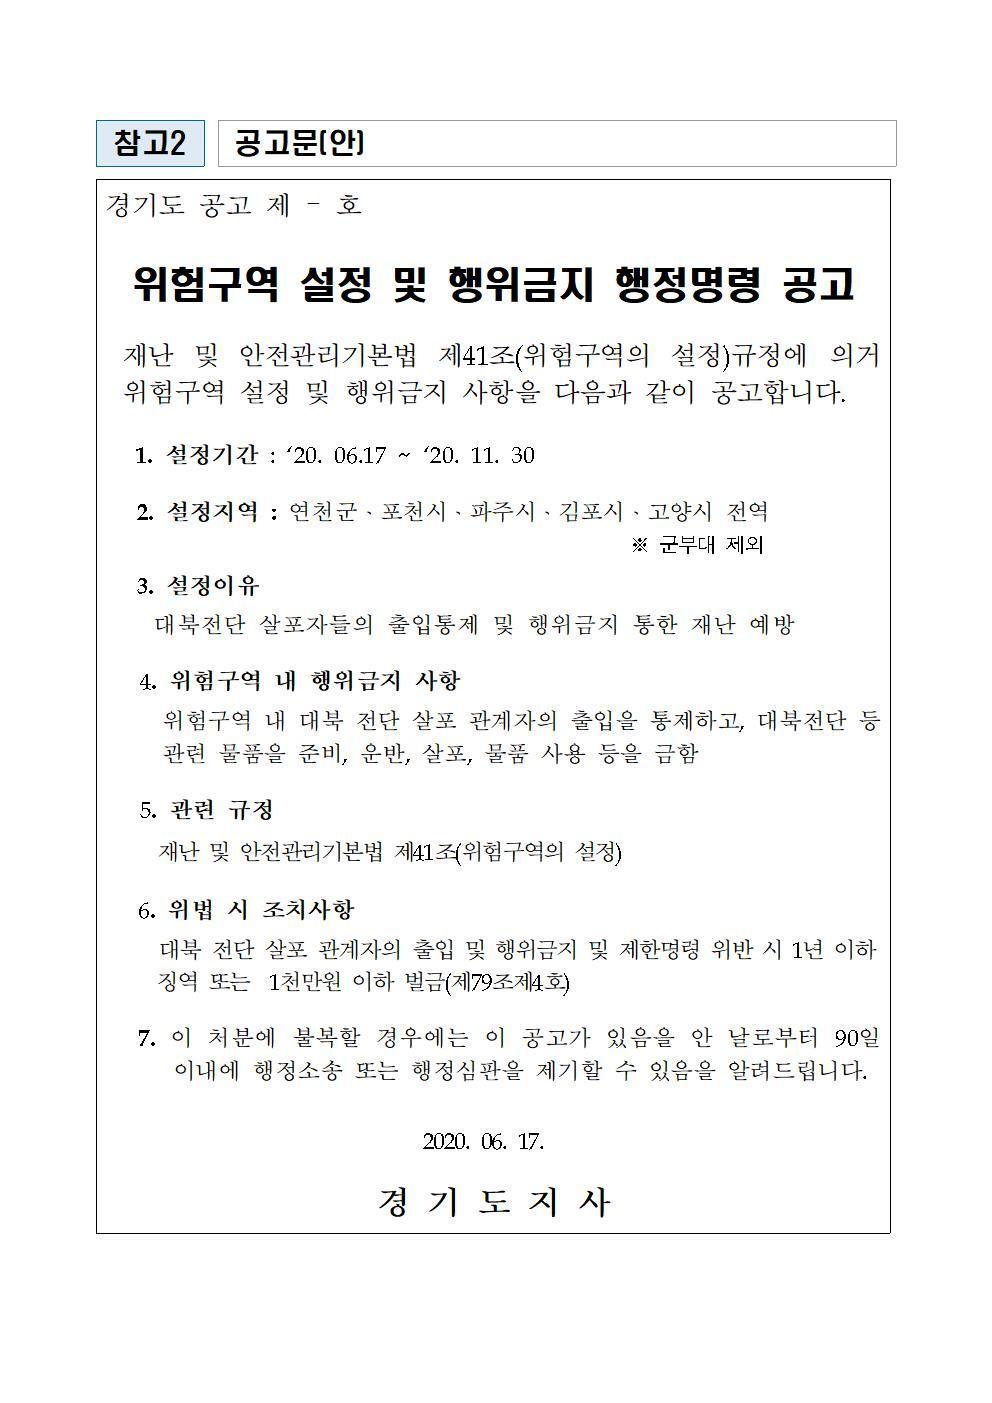 (Gyeonggi Provincial Government-Yonhap)